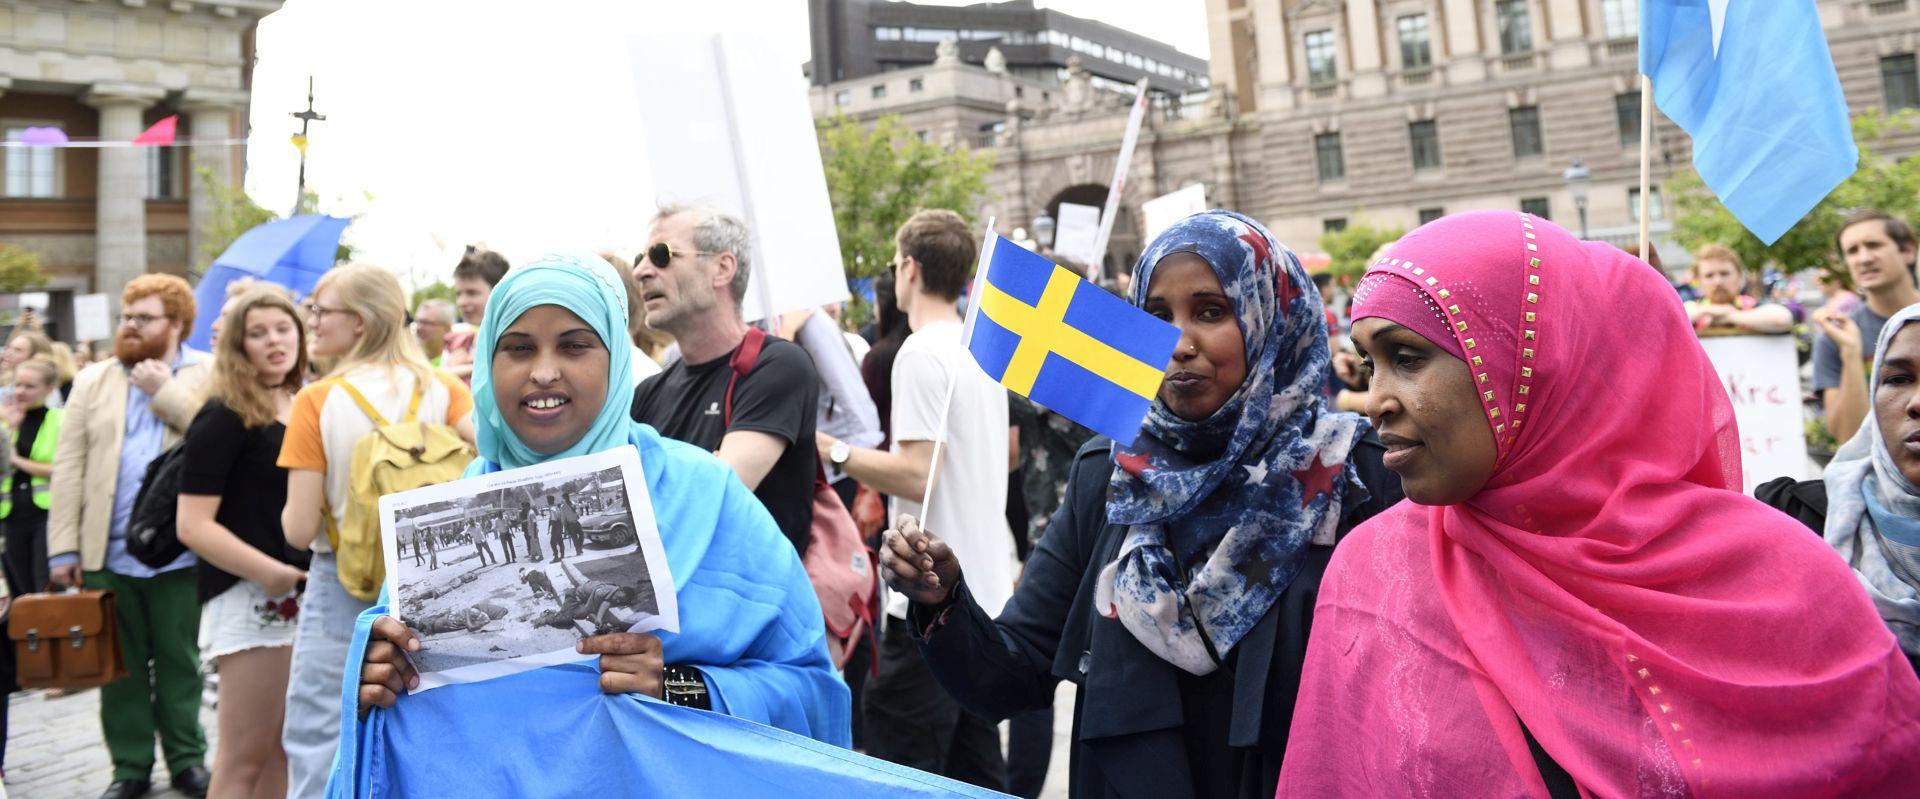 NOVE MJERE NA SNAZI: Švedska postrožila zakone o azilu